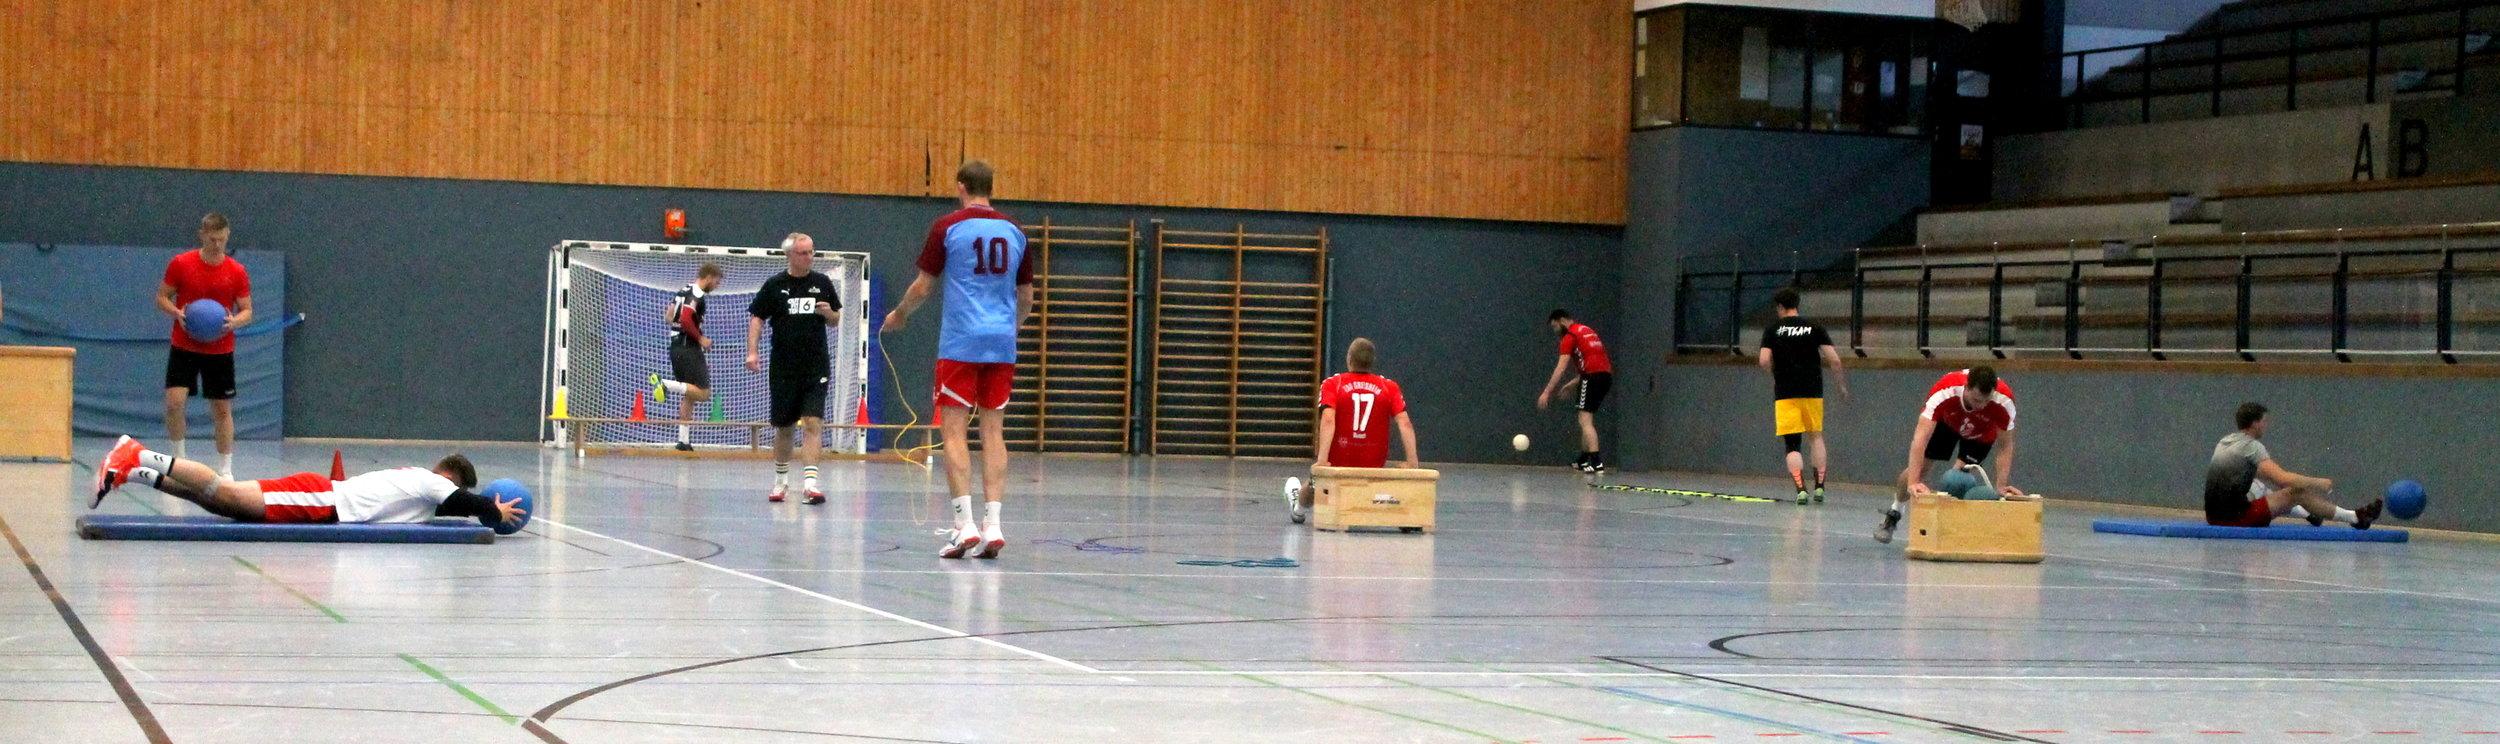 Training 1-001.JPG